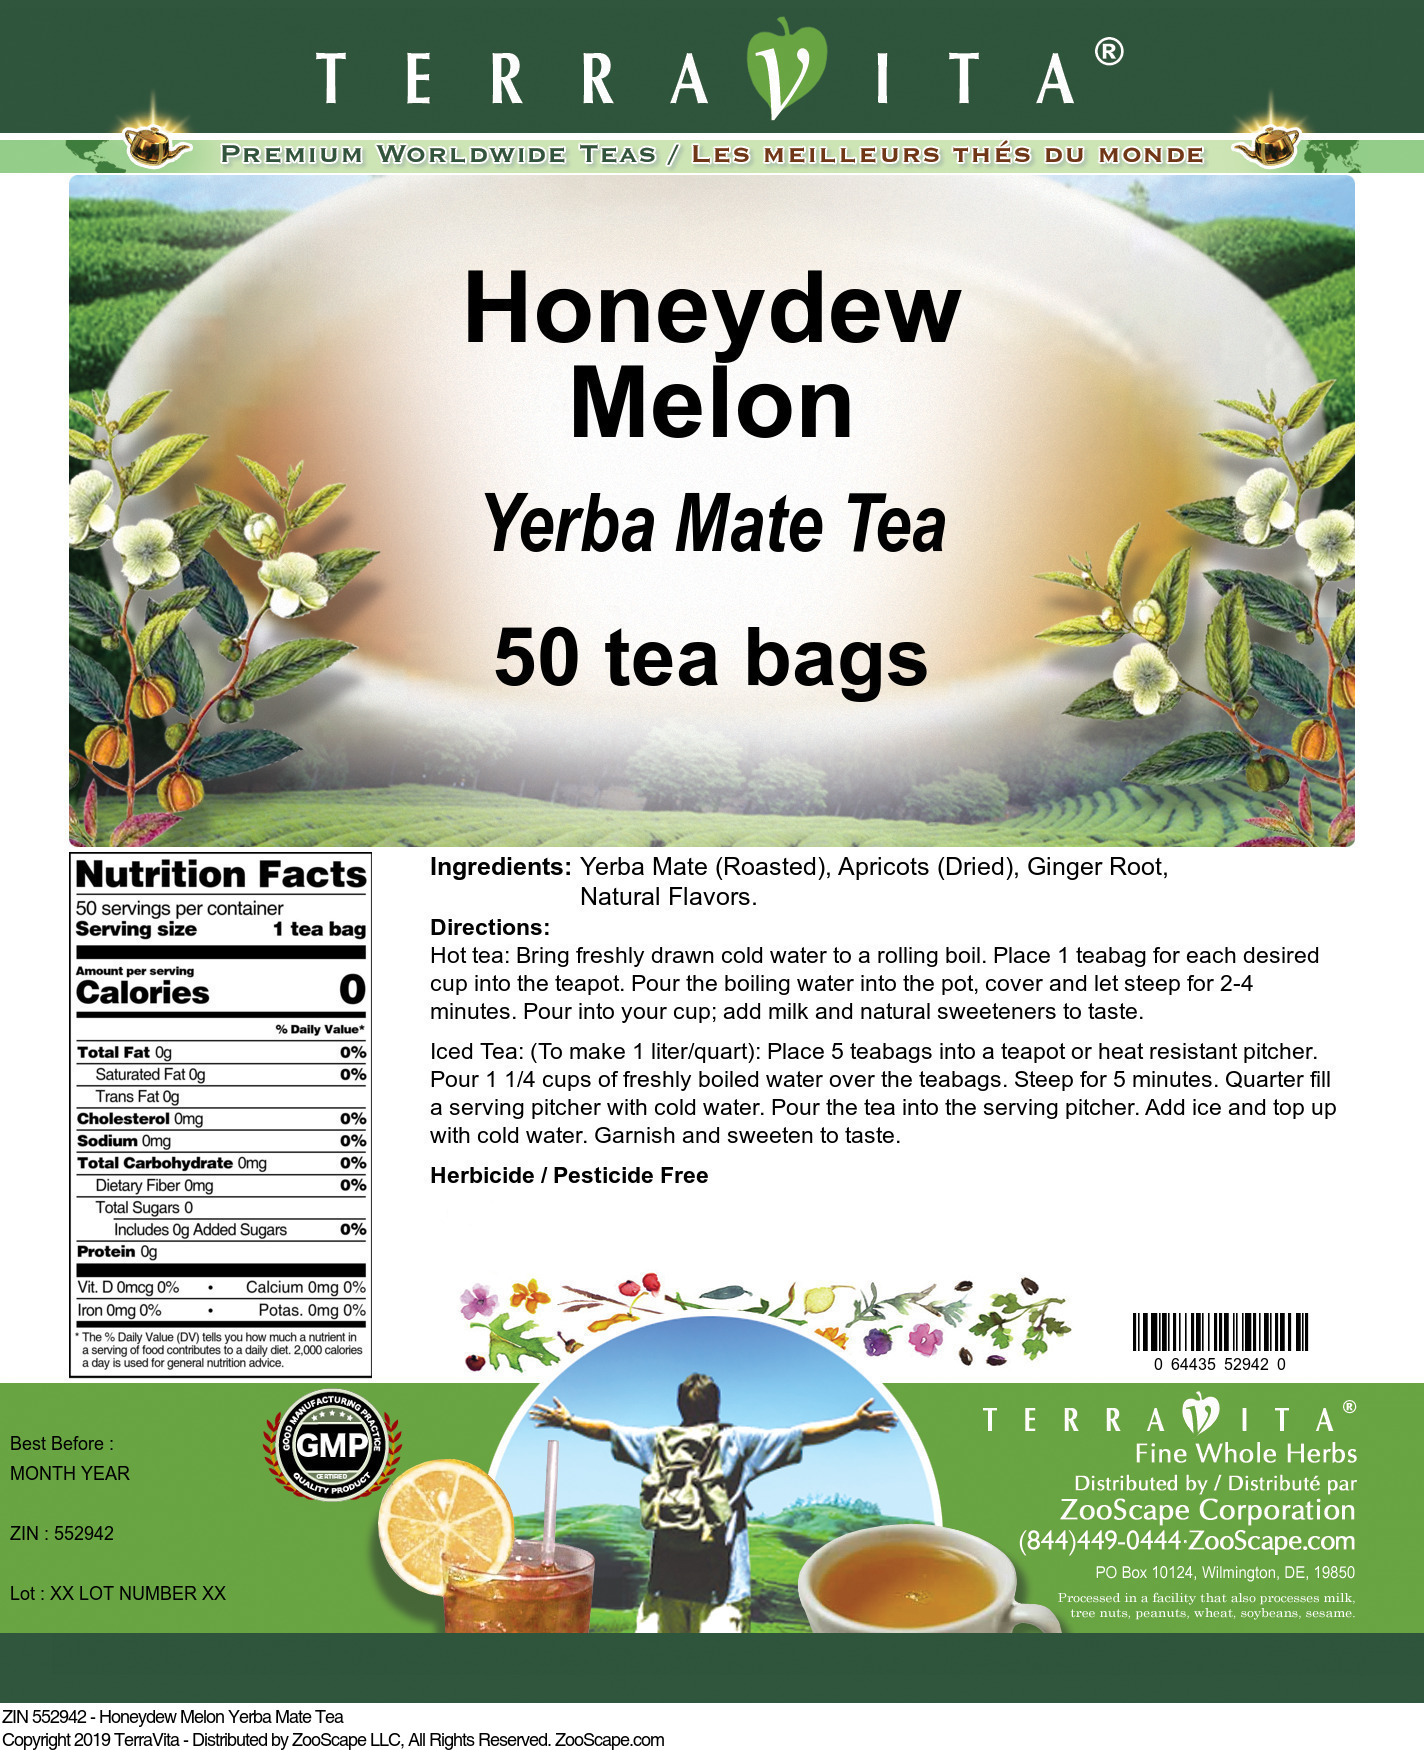 Honeydew Melon Yerba Mate